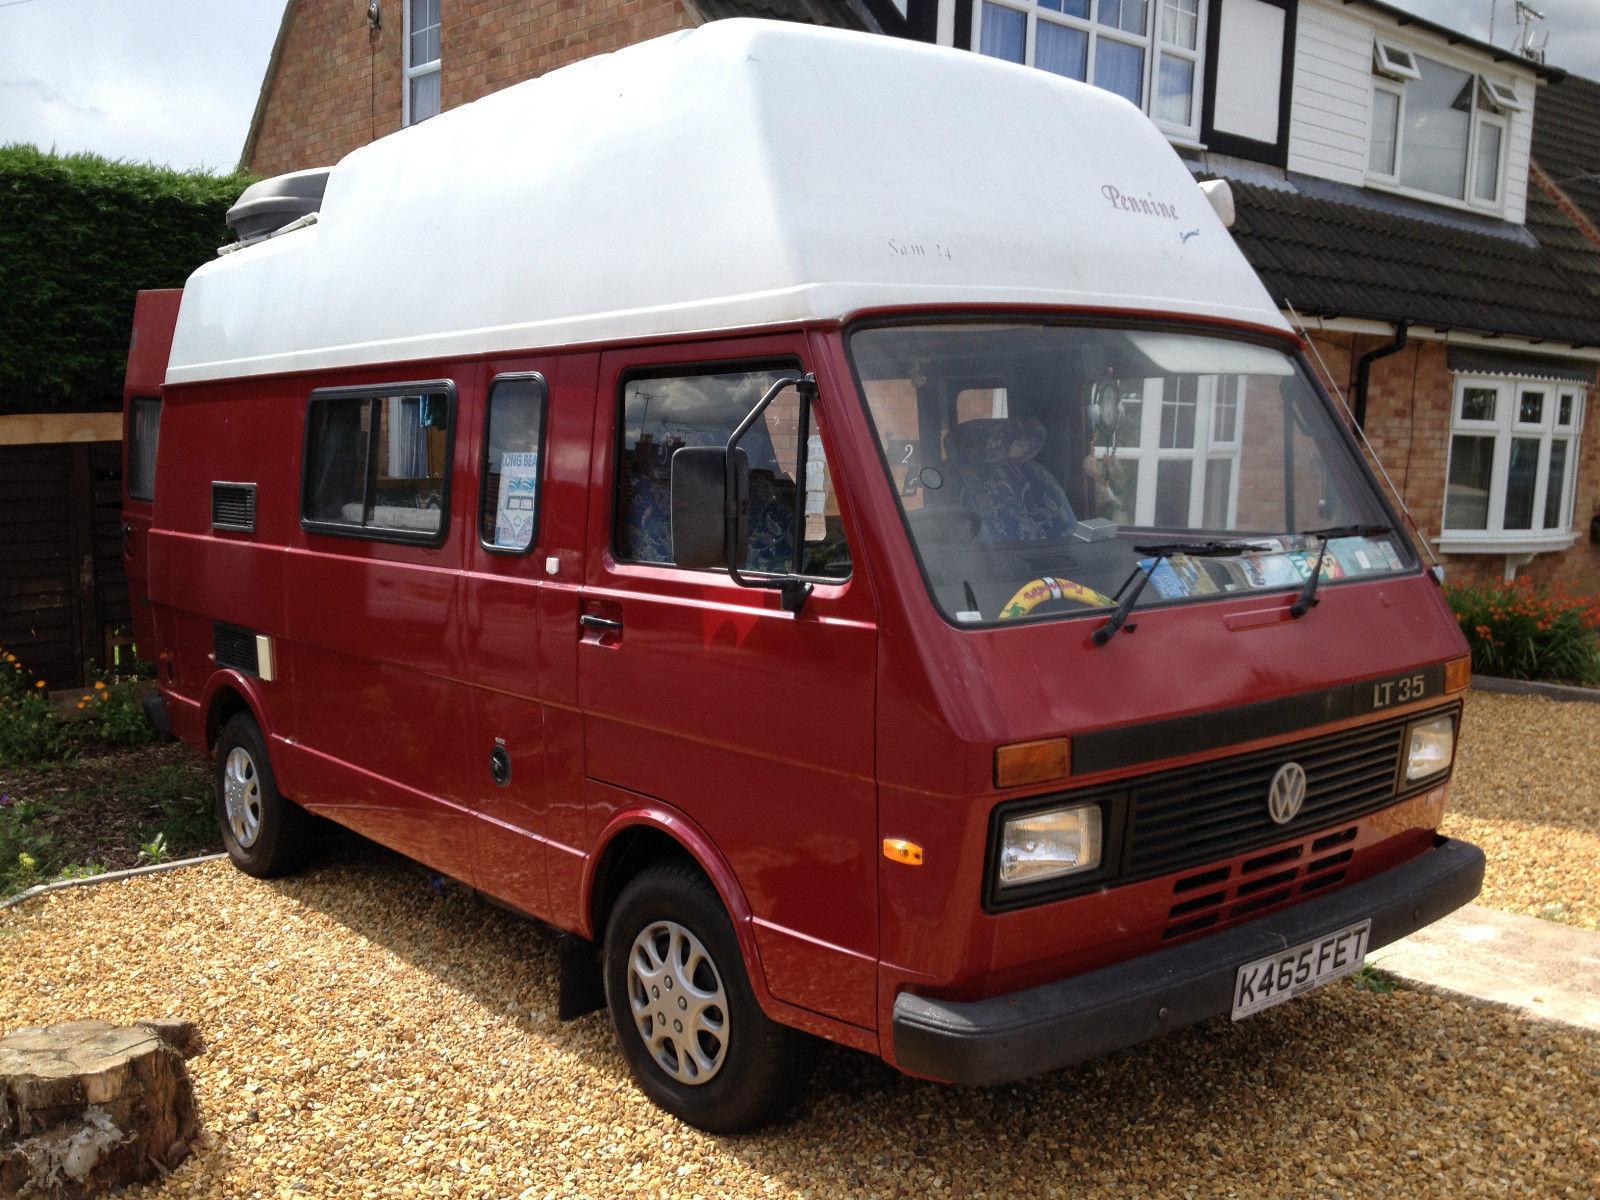 Used RVs 1993 VW LT35 Campervan For Sale For Sale by Owner